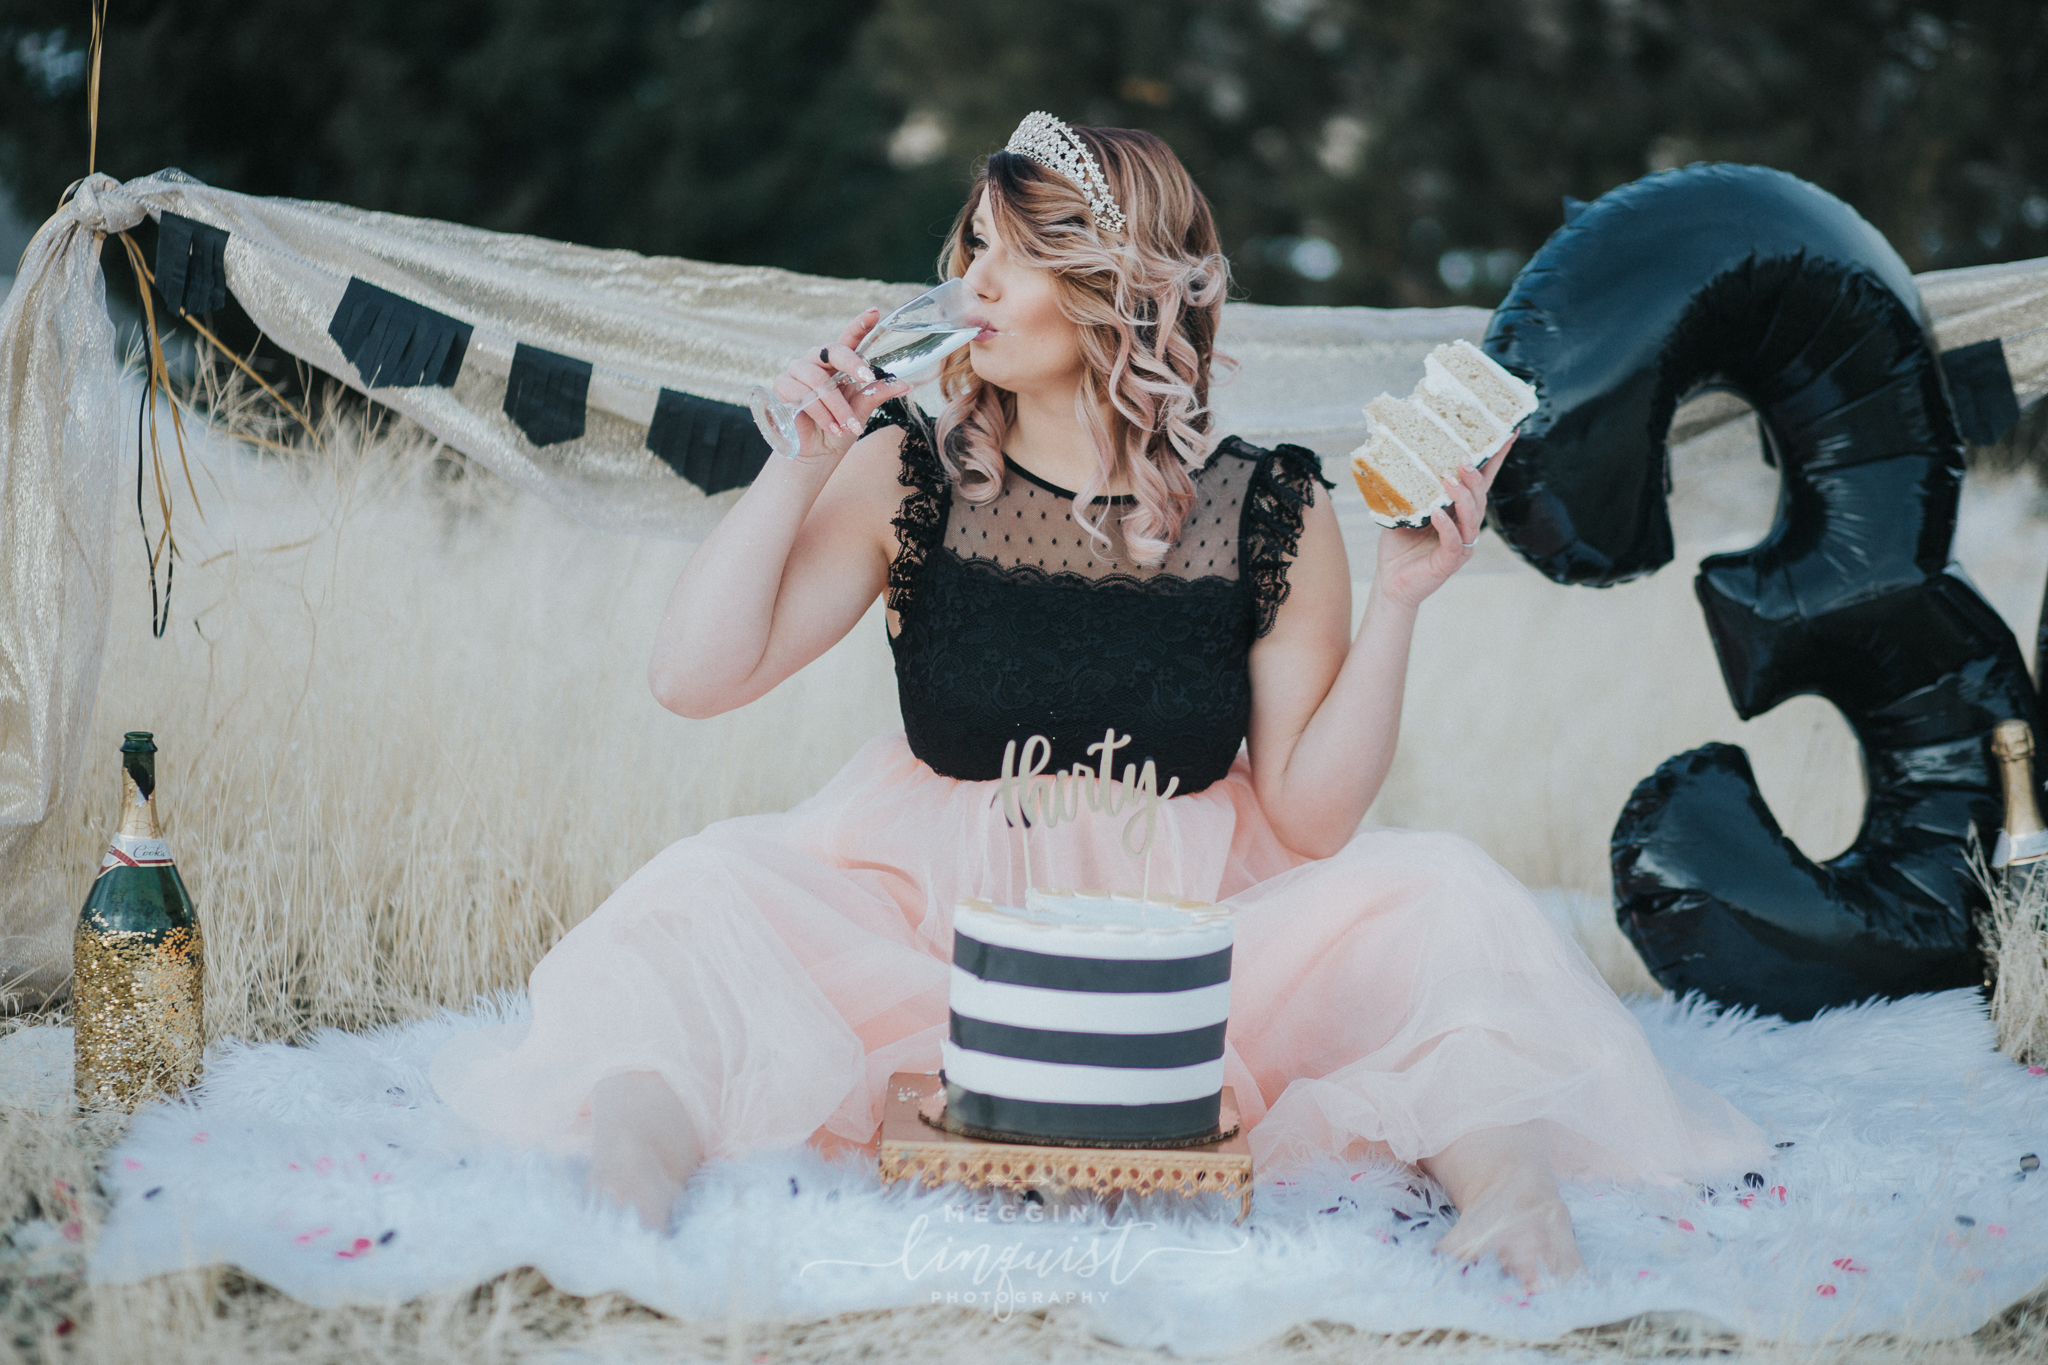 30th-birthday-cake-smash-reno-lake-tahoe-photographer-21.jpg